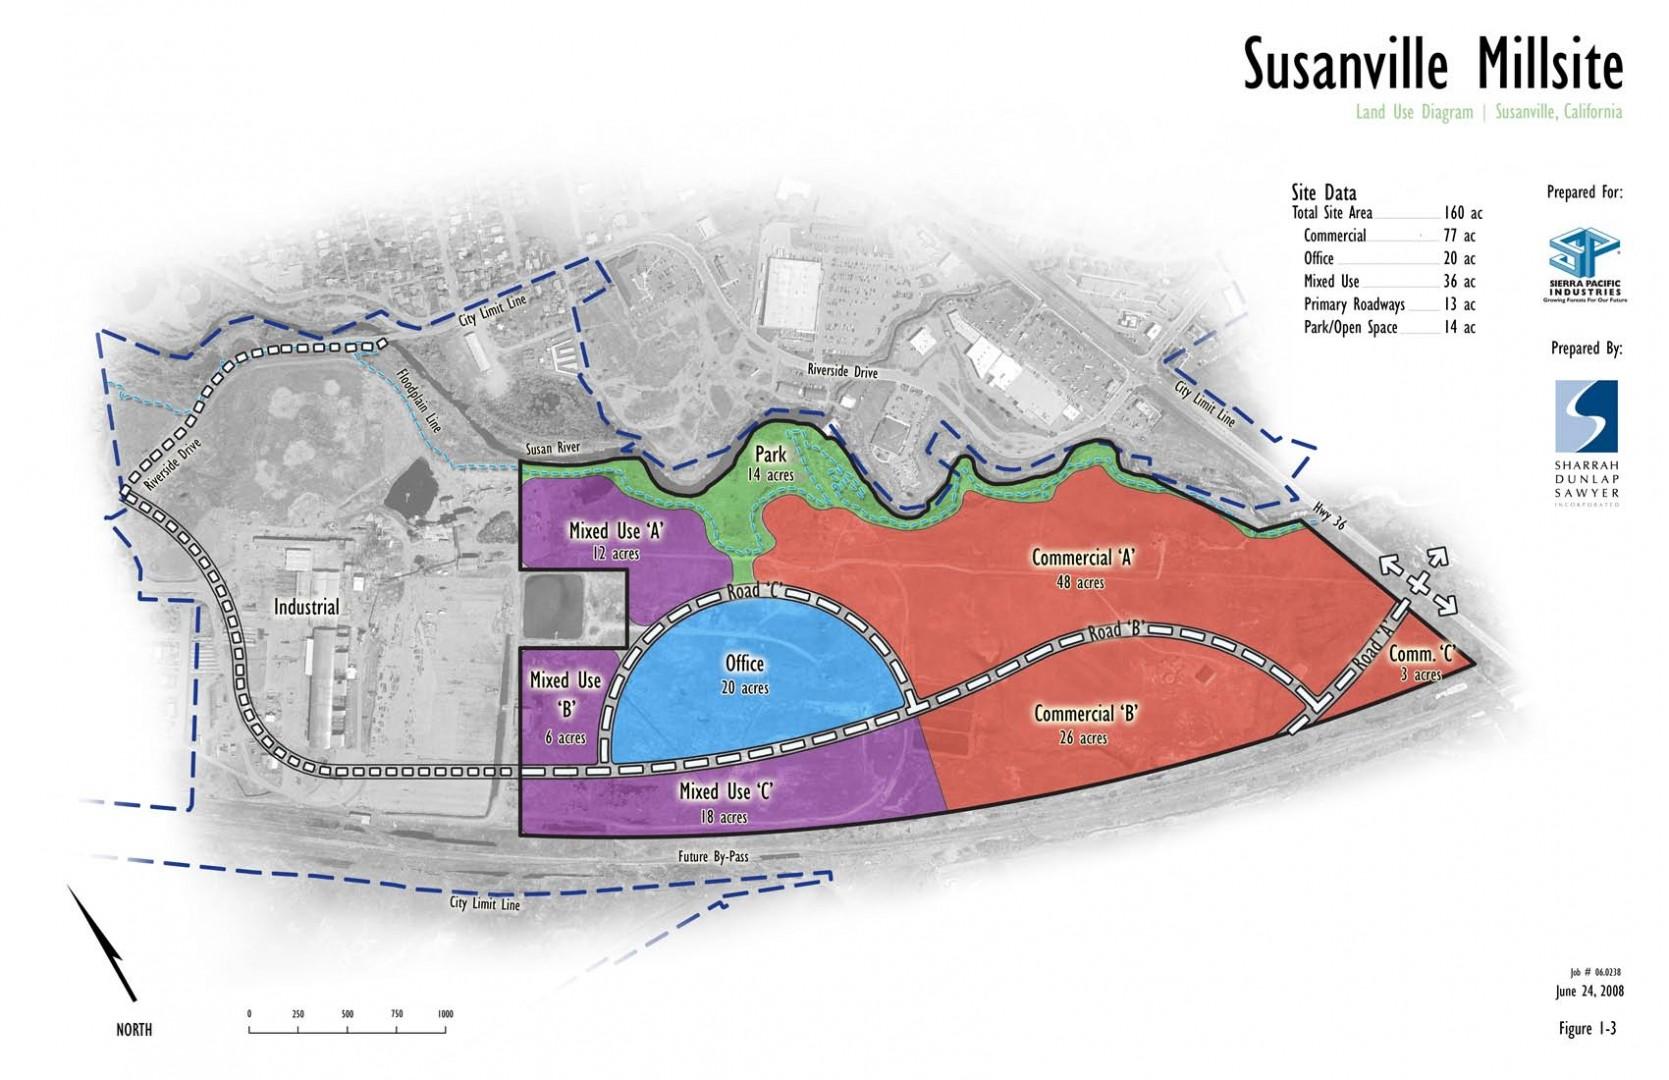 Susanville Millsite